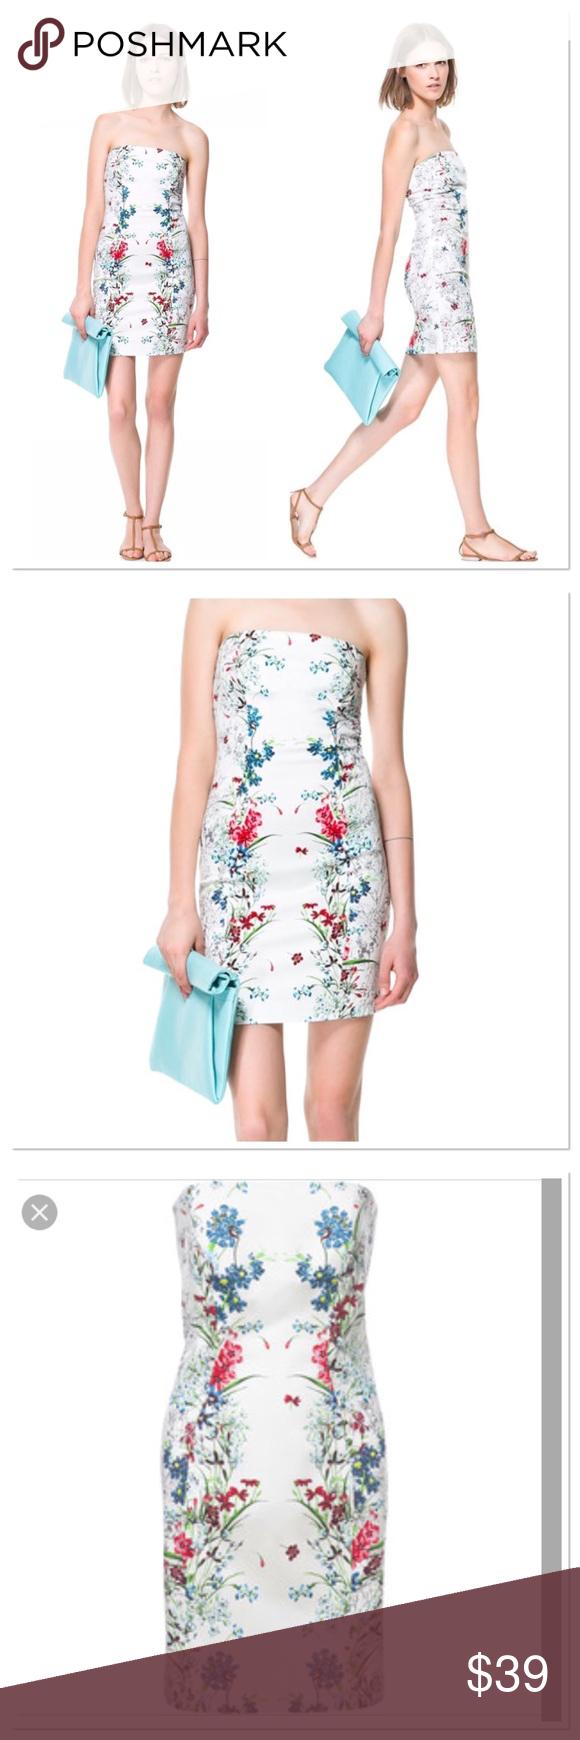 Zara Basic floral print strapless bodycon